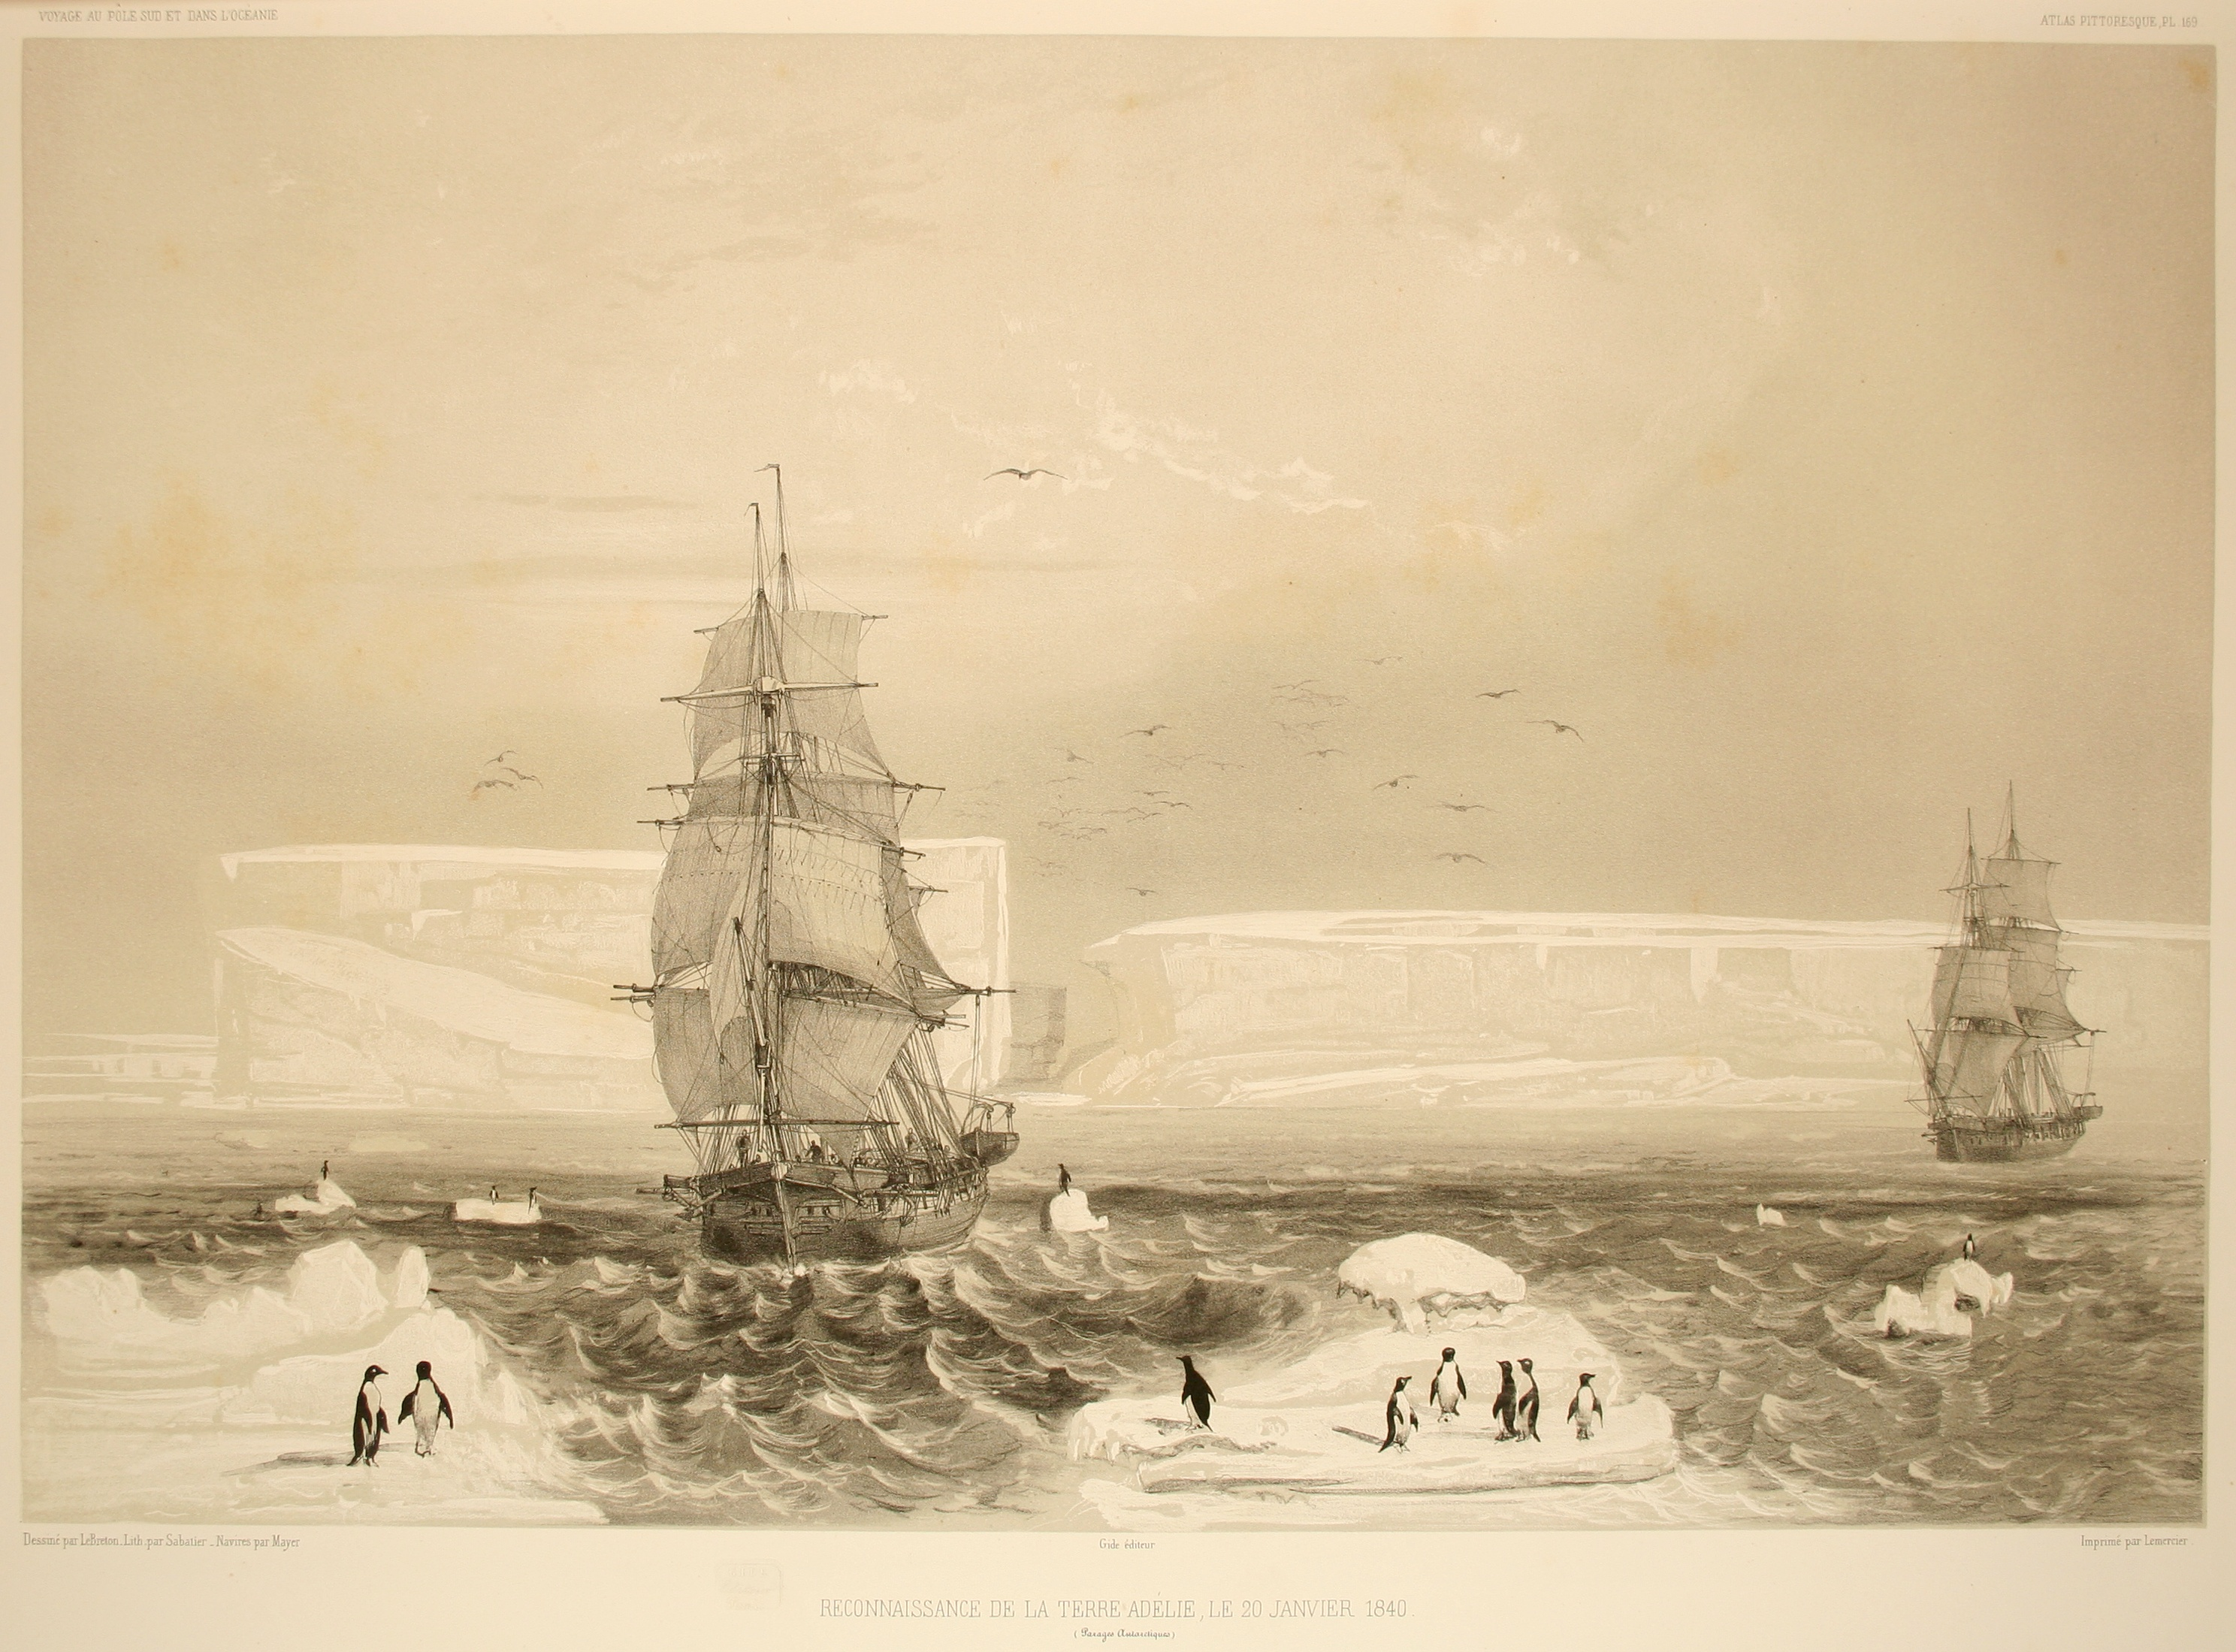 Discovery of Adélie Land by Jules Dumont d'Urville, 1840.